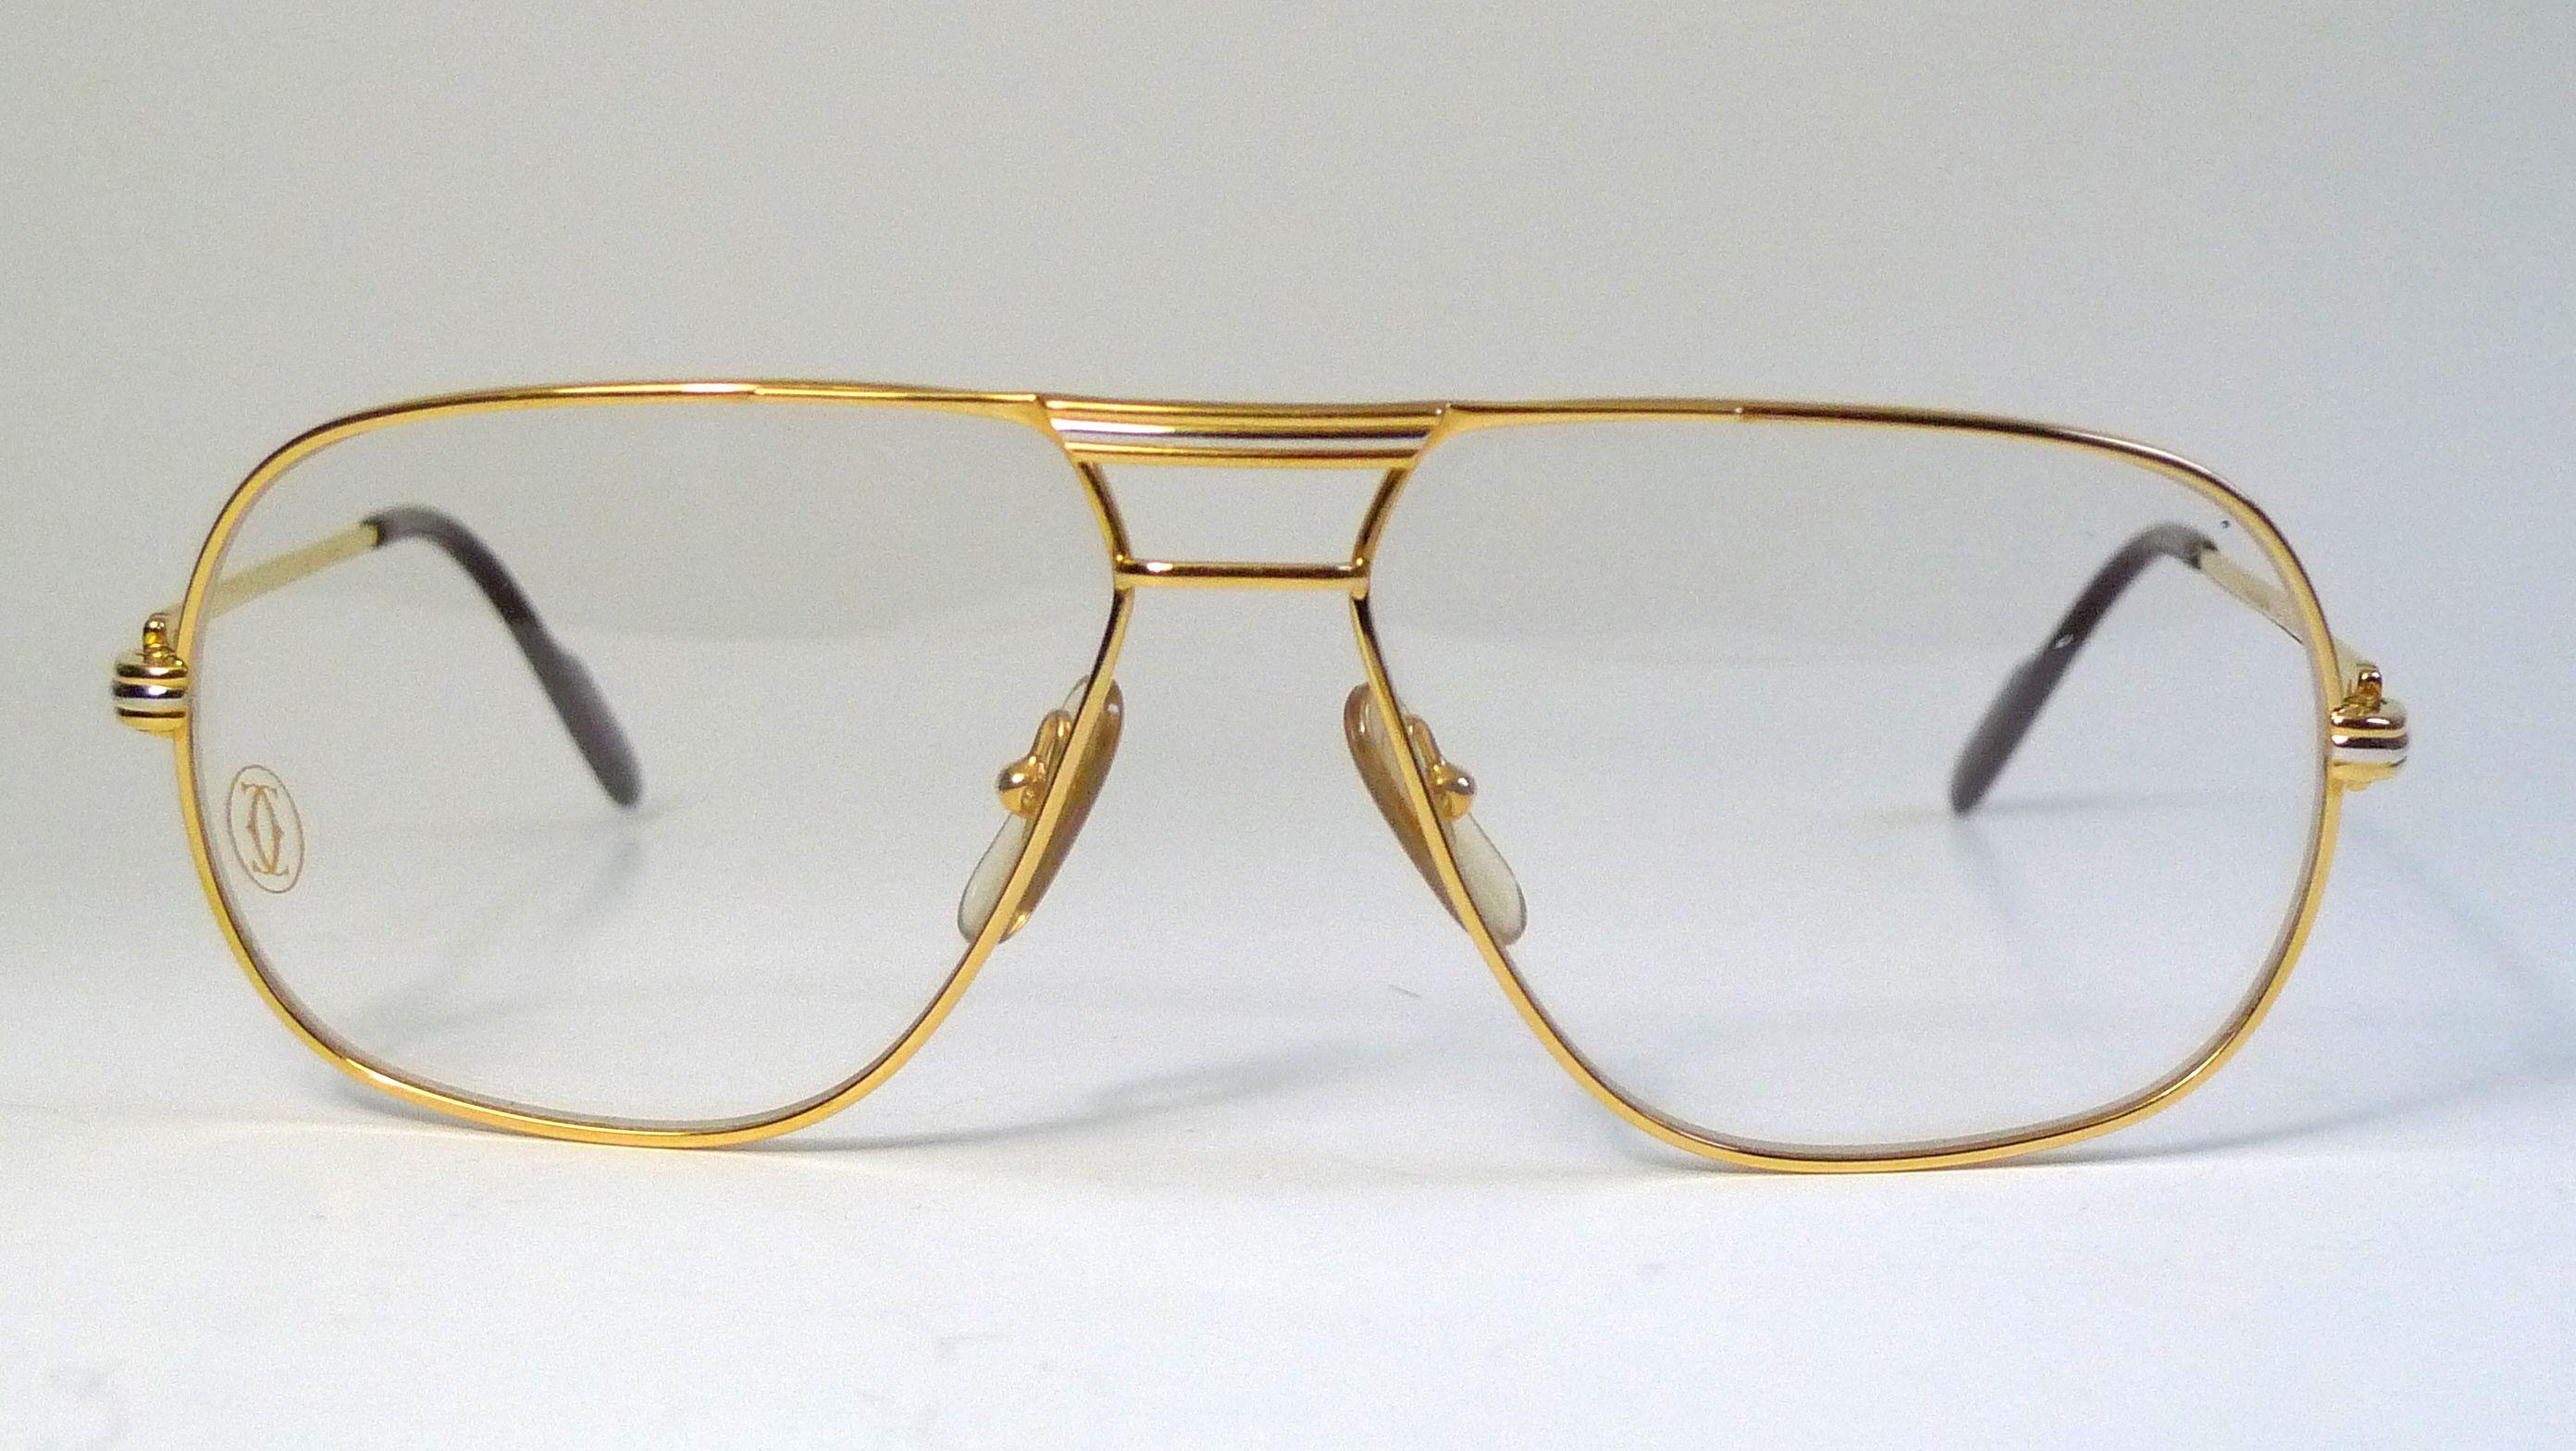 795be73e8c96 CARTIER TANK LOUIS CARTIER – Vintage for me   lunettes okulary ...